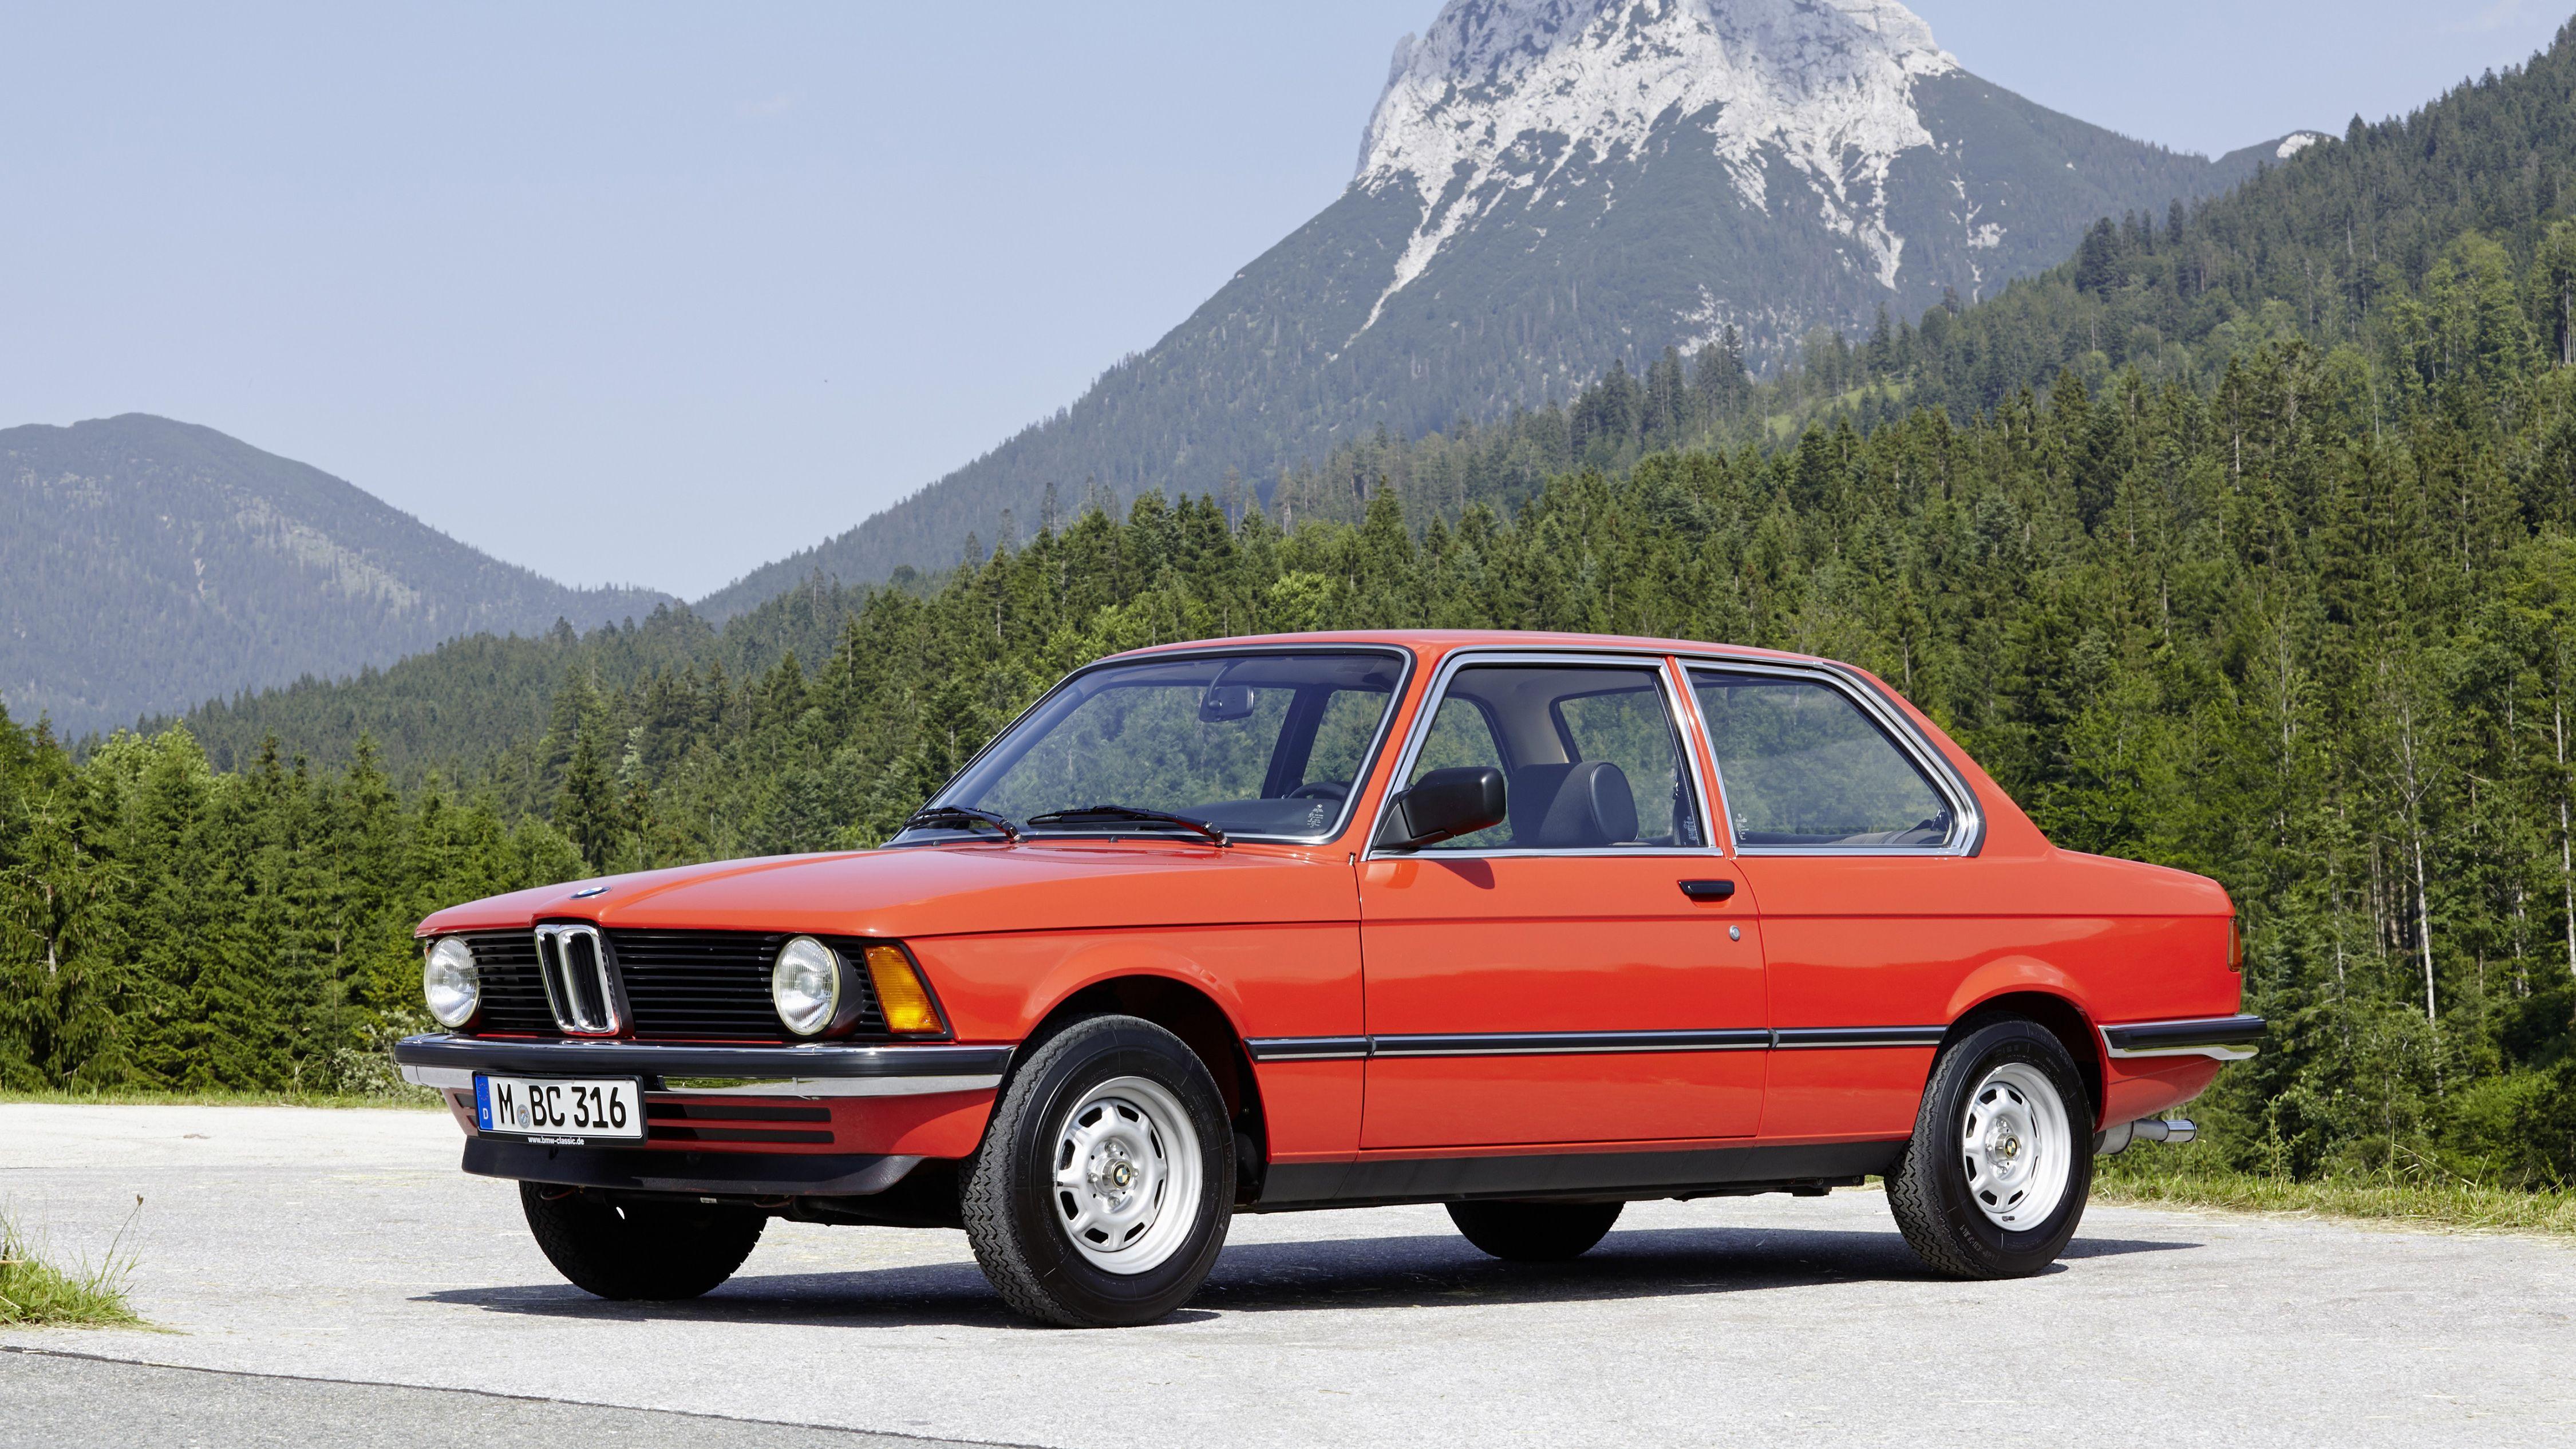 BMW 316 Coupe (E21) 1975 | BMW | Pinterest | BMW, Auto design and Cars